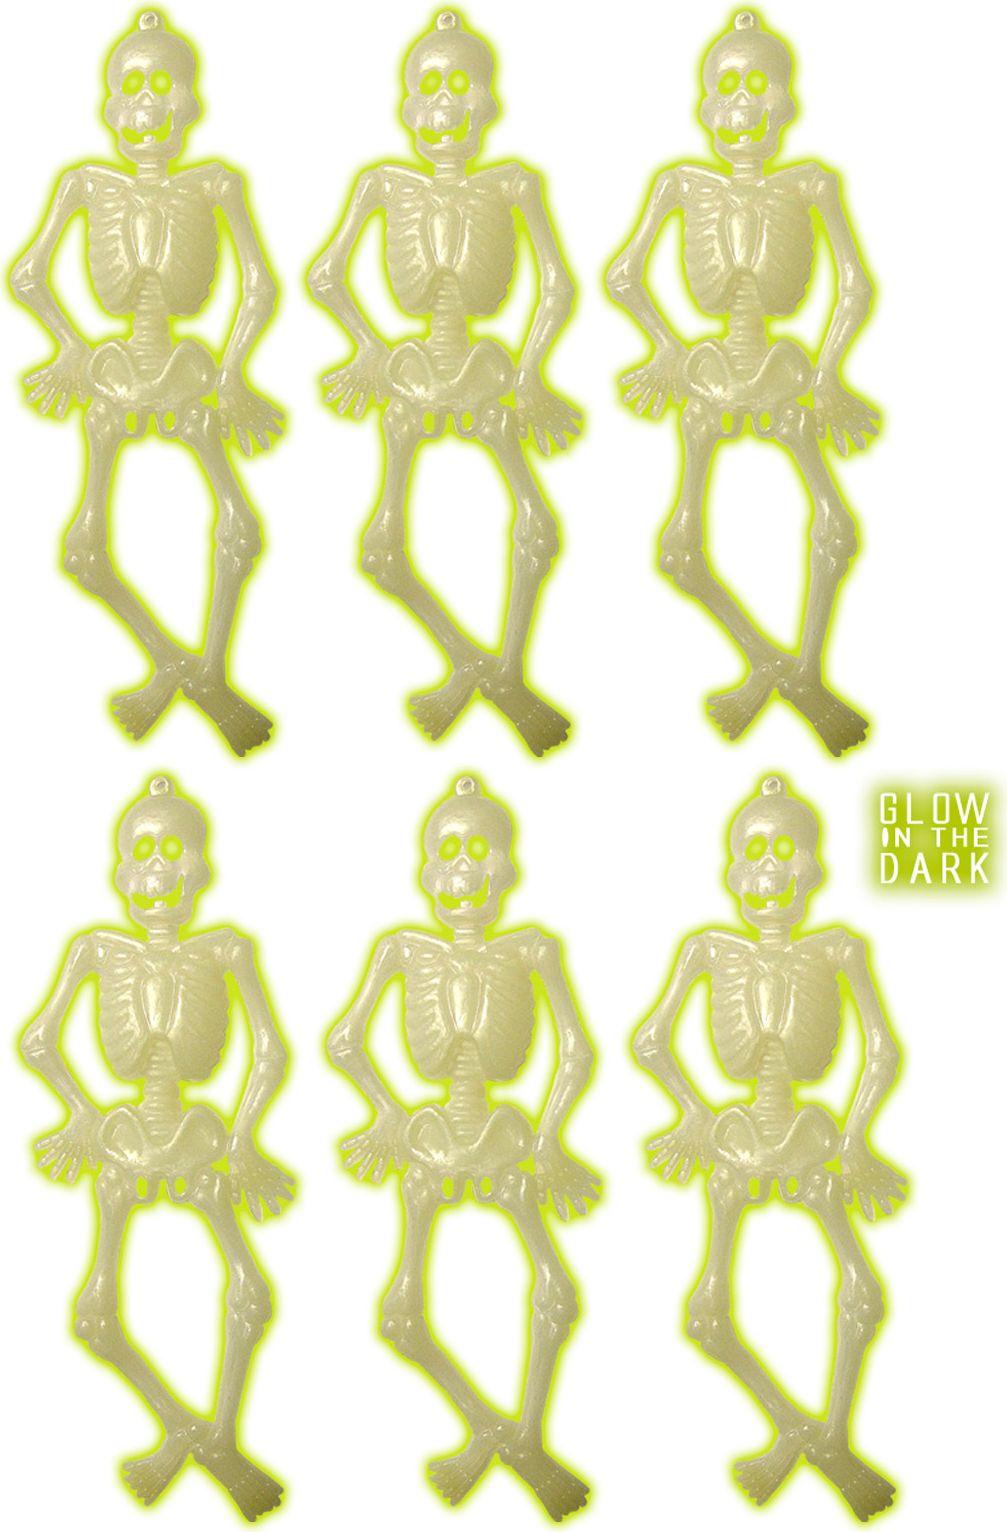 Skelet set glow in the dark 6 stuks